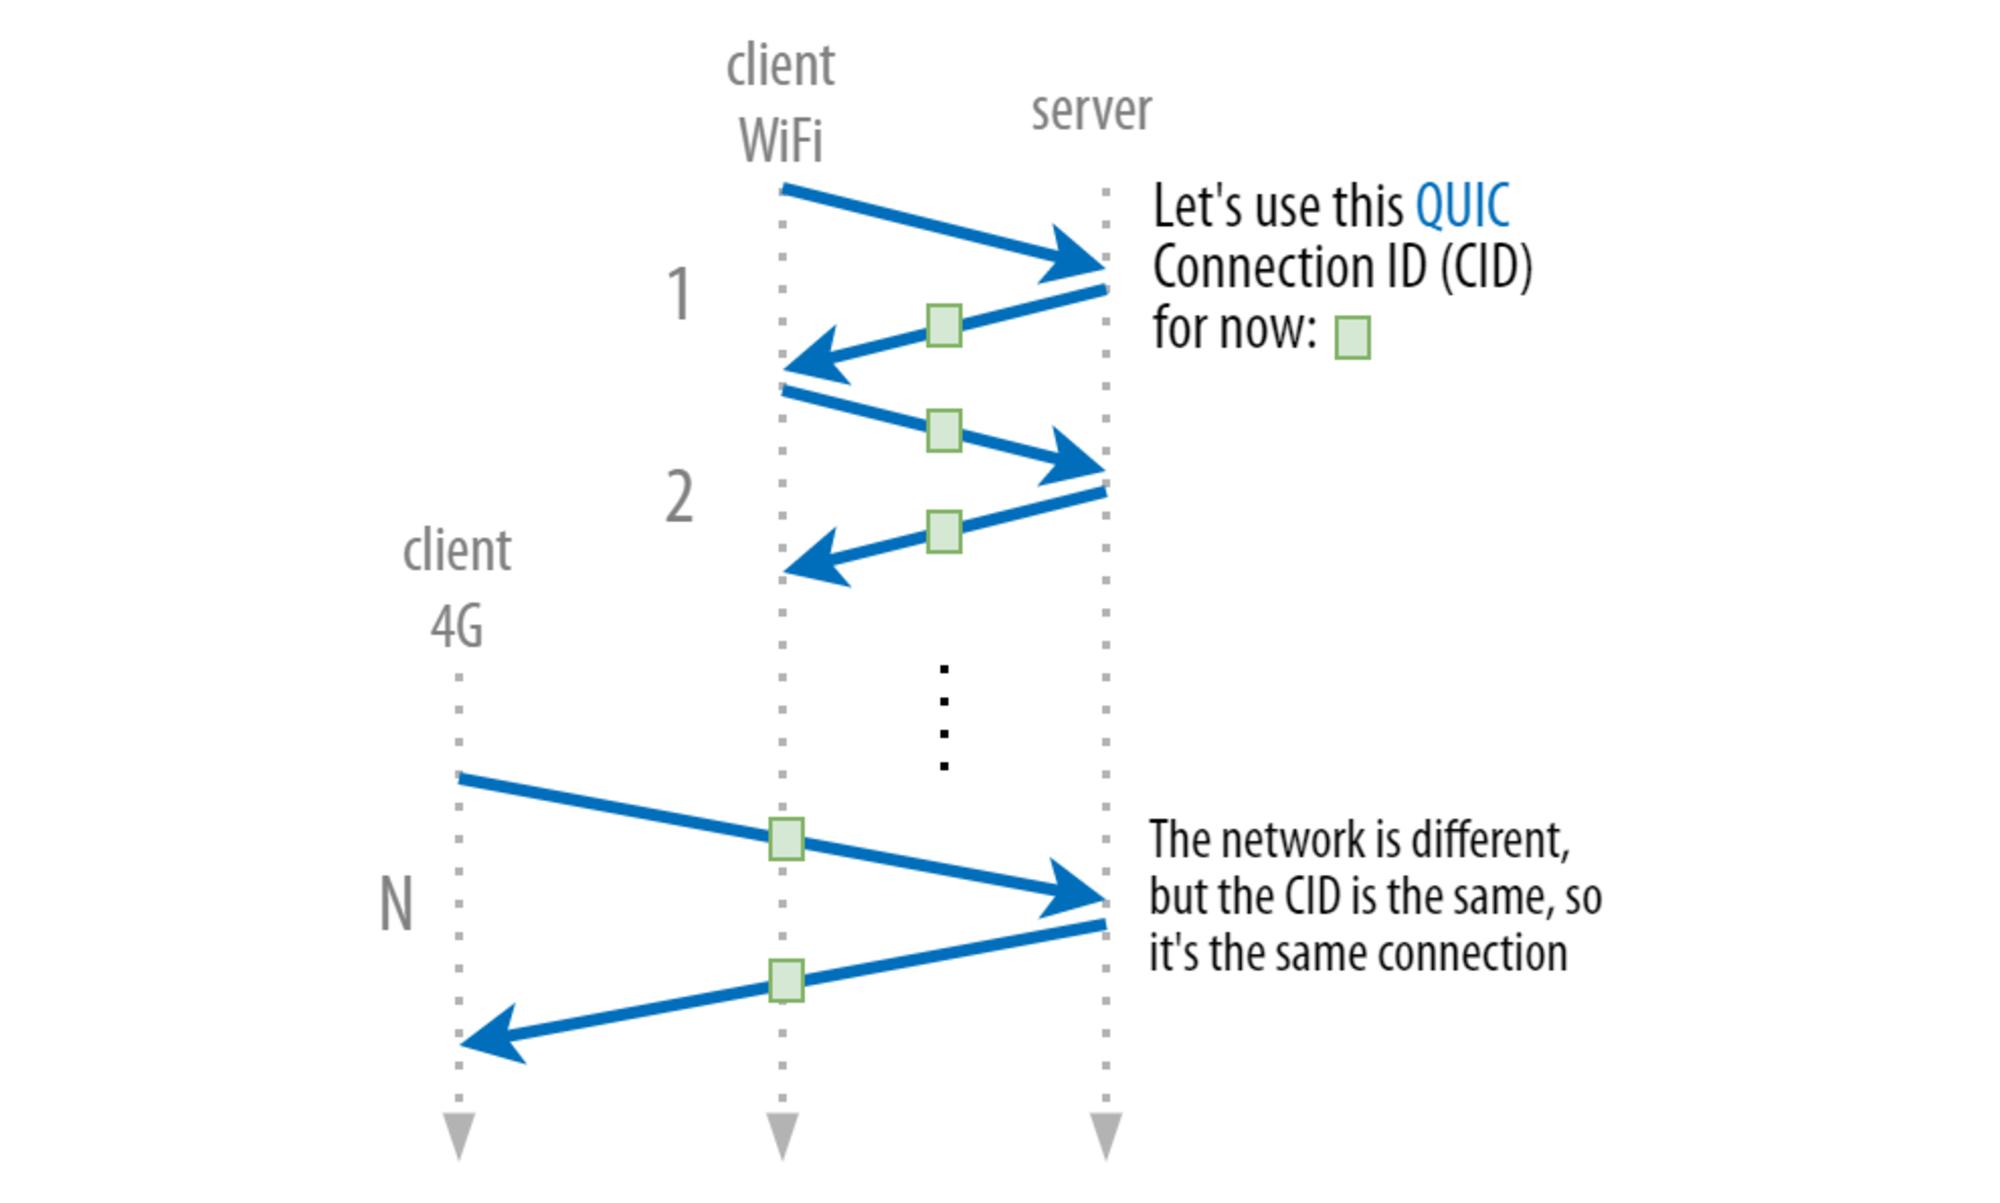 https://res.cloudinary.com/indysigner/image/fetch/f_auto,q_80/w_2000/https://cloud.netlifyusercontent.com/assets/344dbf88-fdf9-42bb-adb4-46f01eedd629/e6ae0ec1-3b85-49a9-9707-ee21ce5b02b3/2-migration-single-cid.png